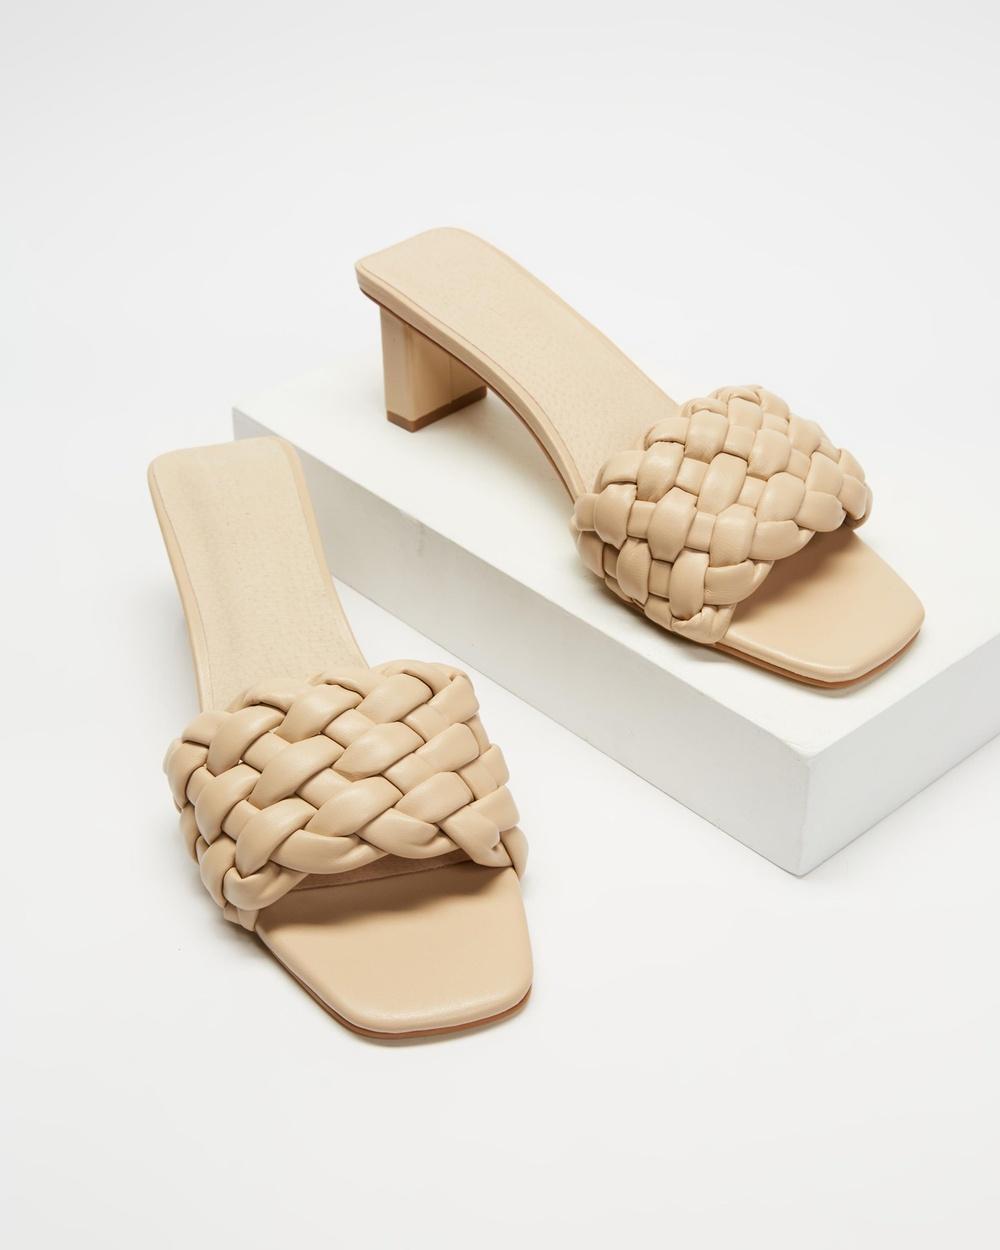 Sol Sana Matias Mules ICONIC EXCLUSIVE Mid-low heels Nude Australia